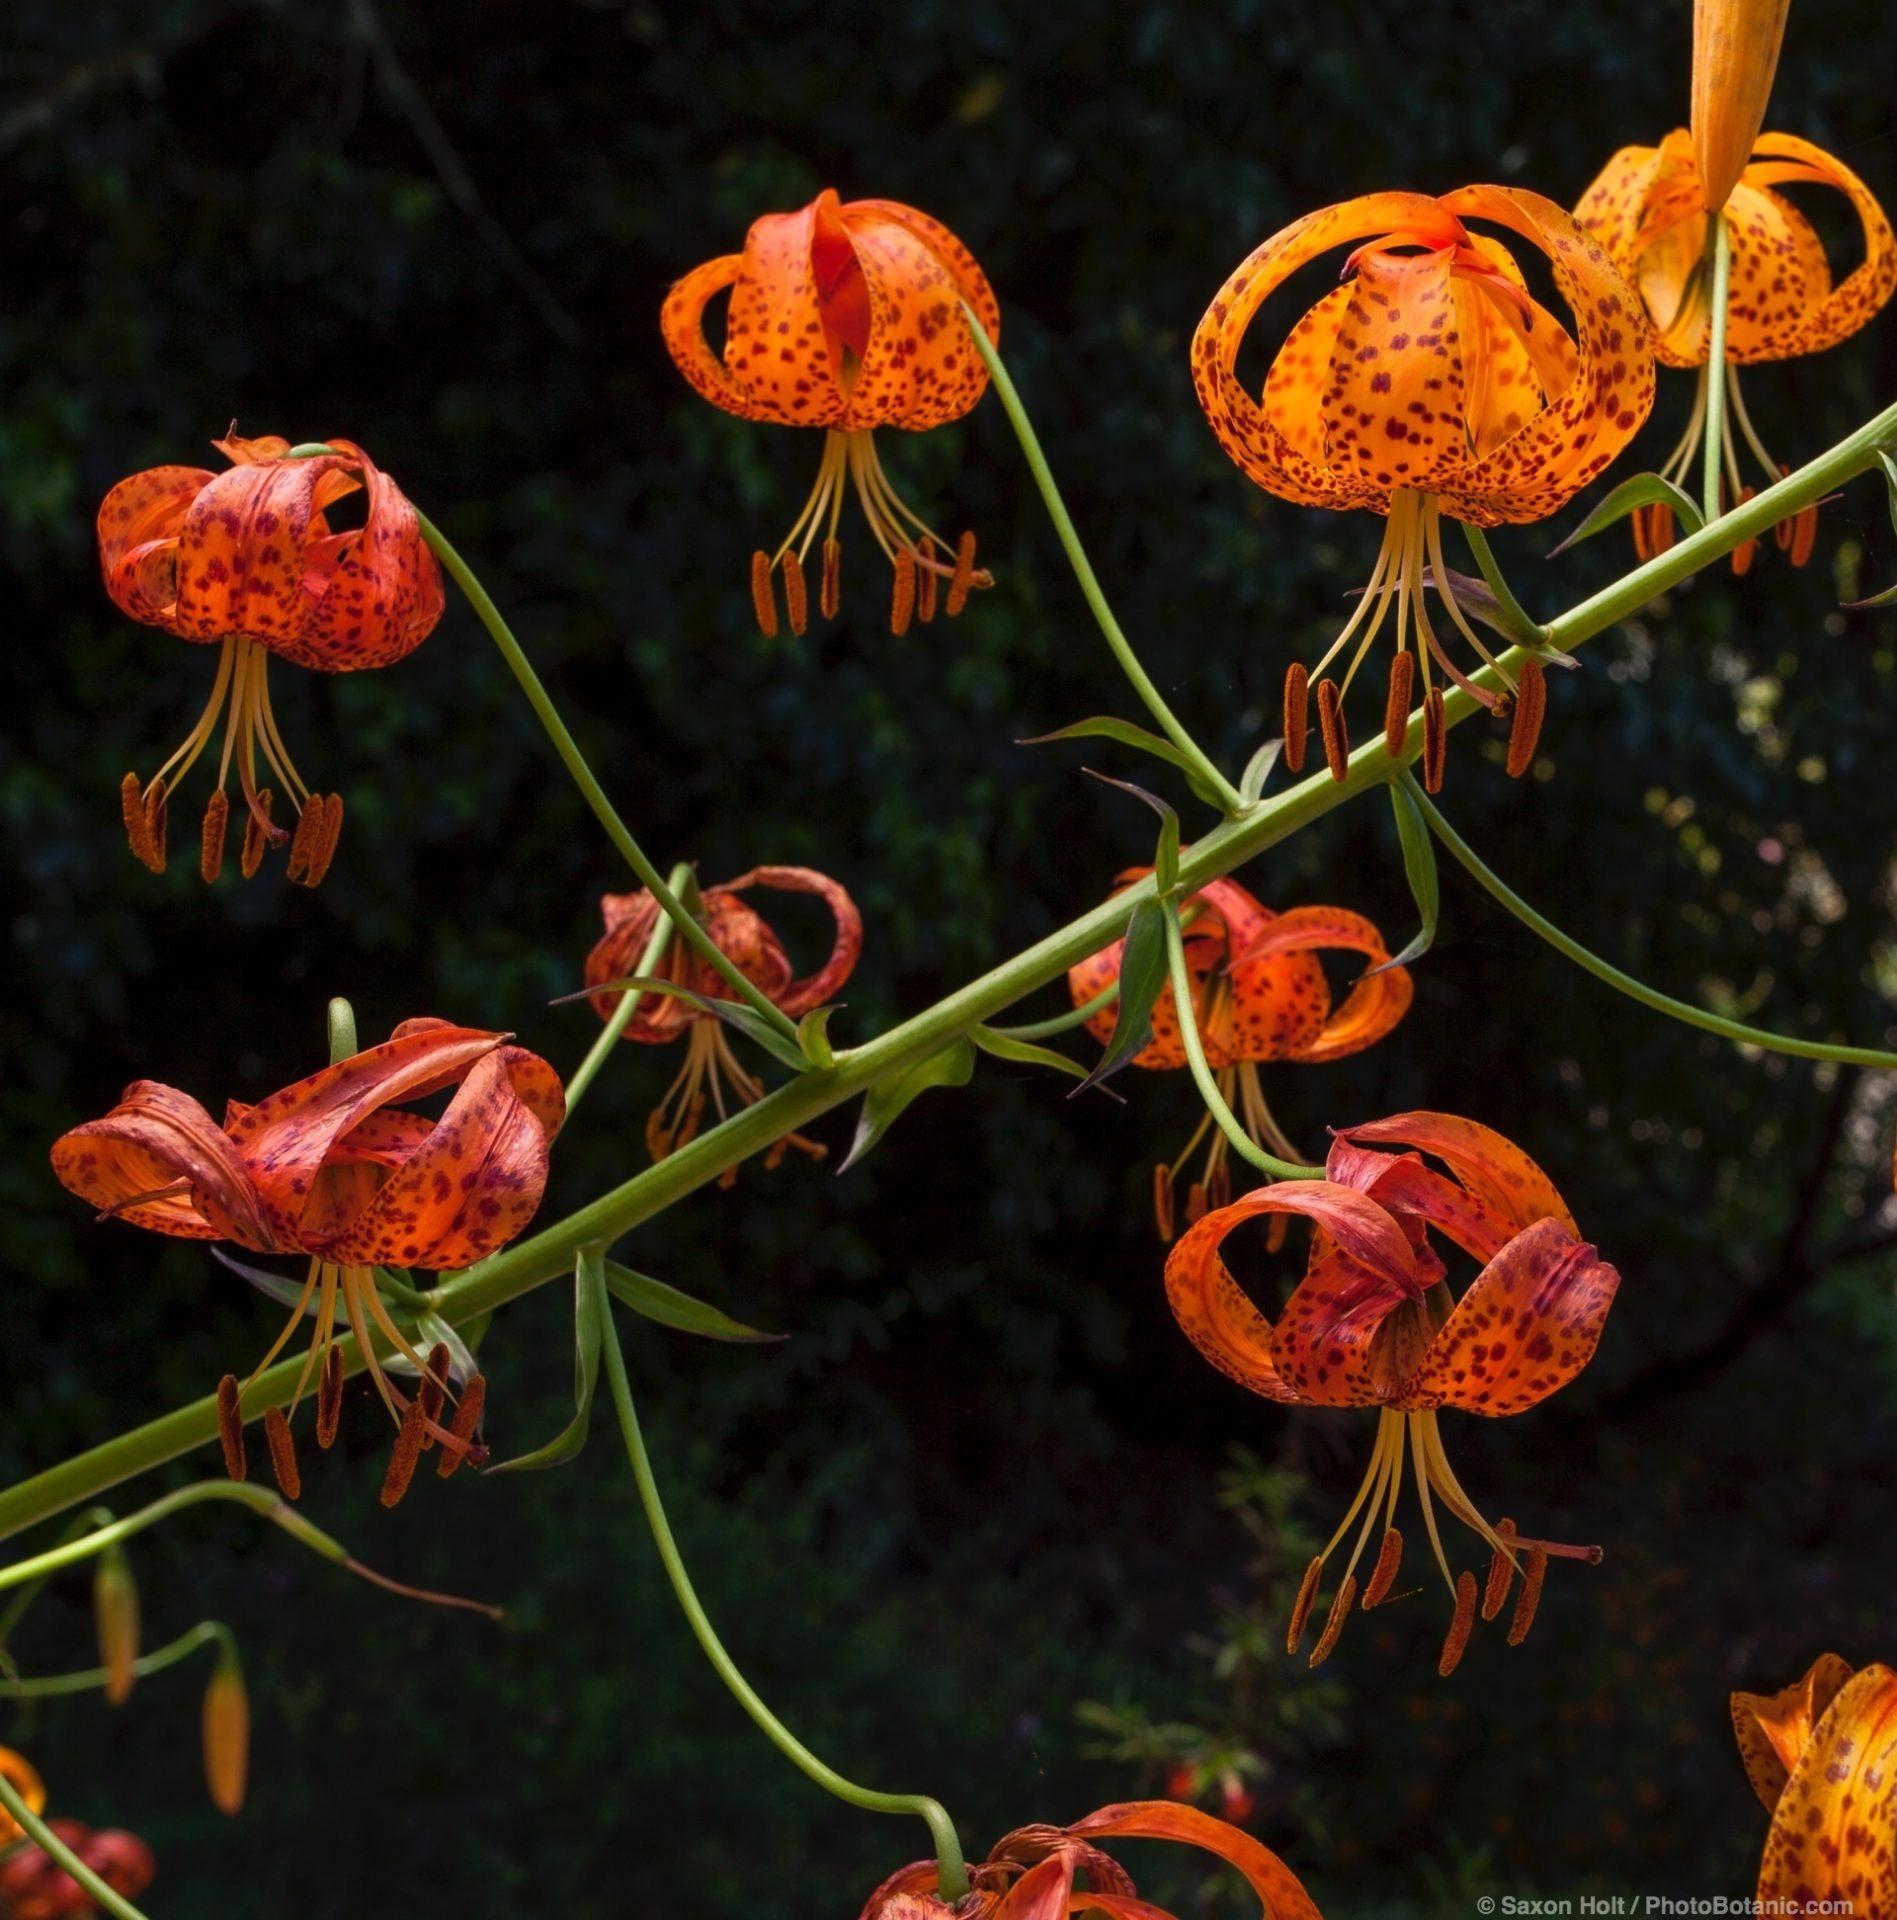 Lilium humboldtii ssp. ocellatum, Humboldt lily, orange flowering California native bulb